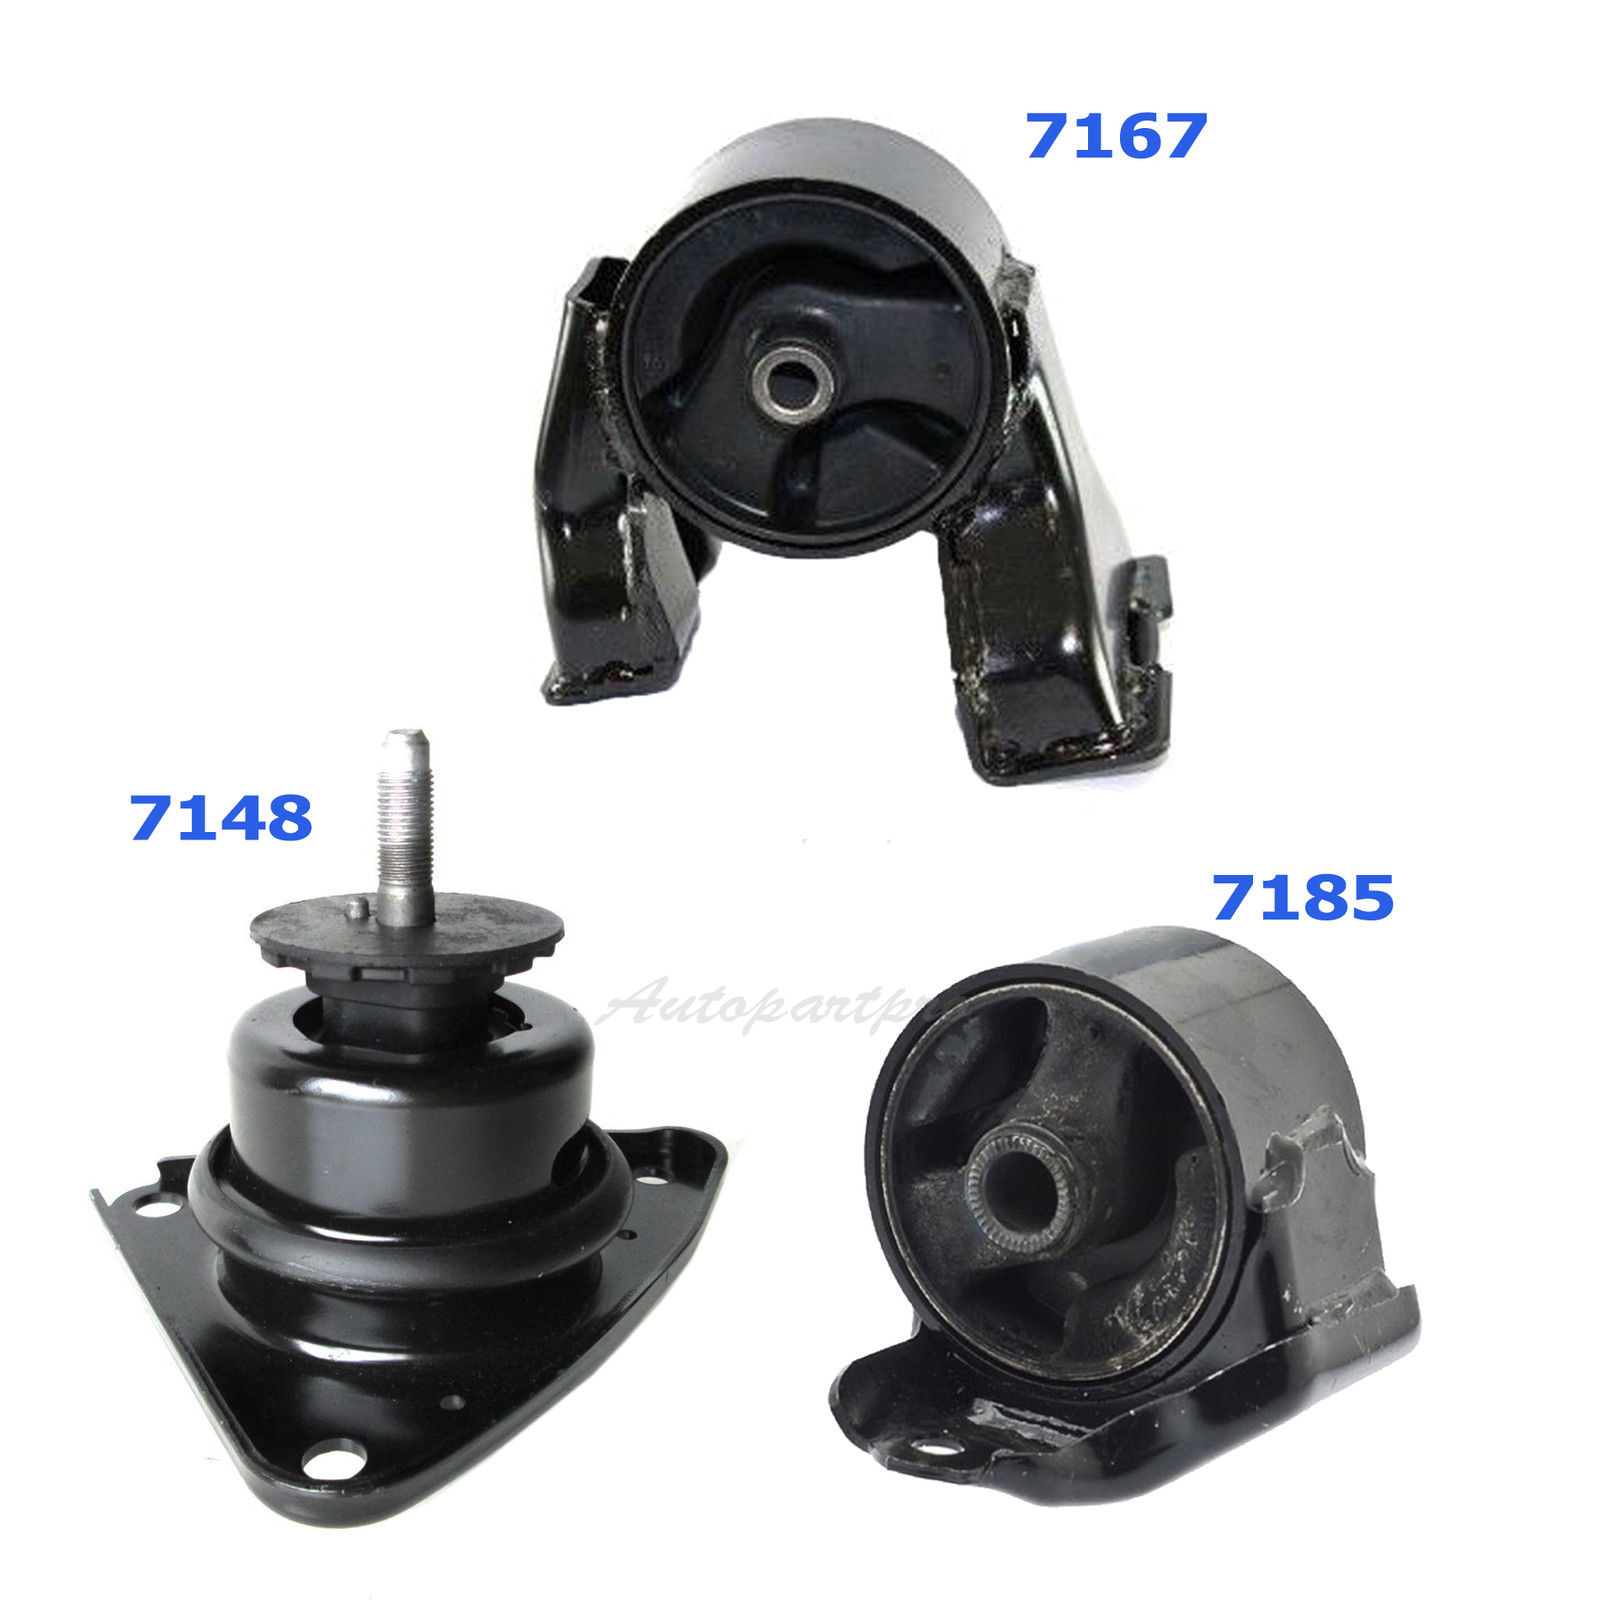 07-10 for Hyundai Elantra 2.0L for Manual. Engine Motor /& Trans Mount Set 3PCS